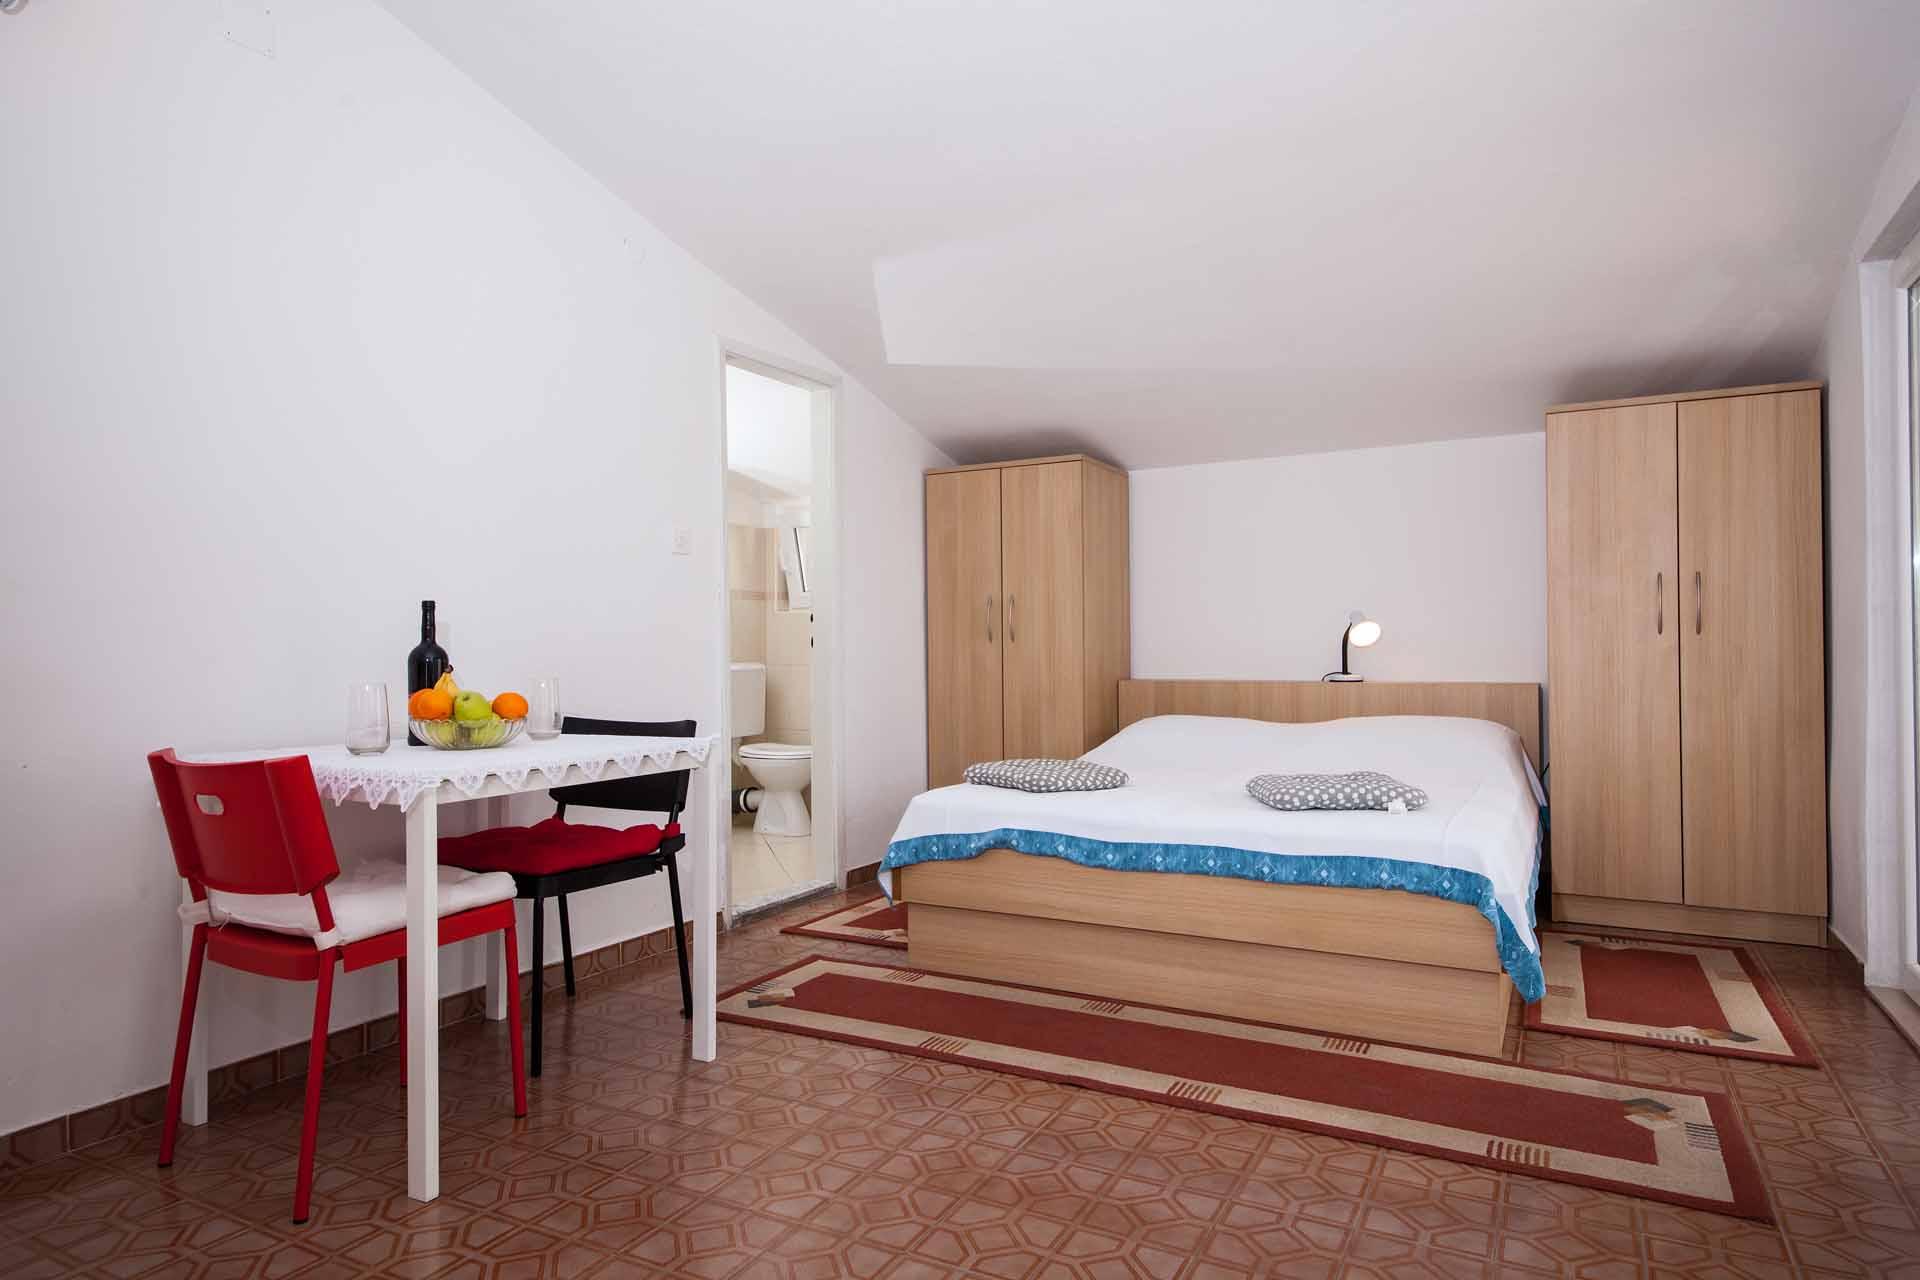 ferienwohnung makarska f r 2 personen appartement lenka a3. Black Bedroom Furniture Sets. Home Design Ideas